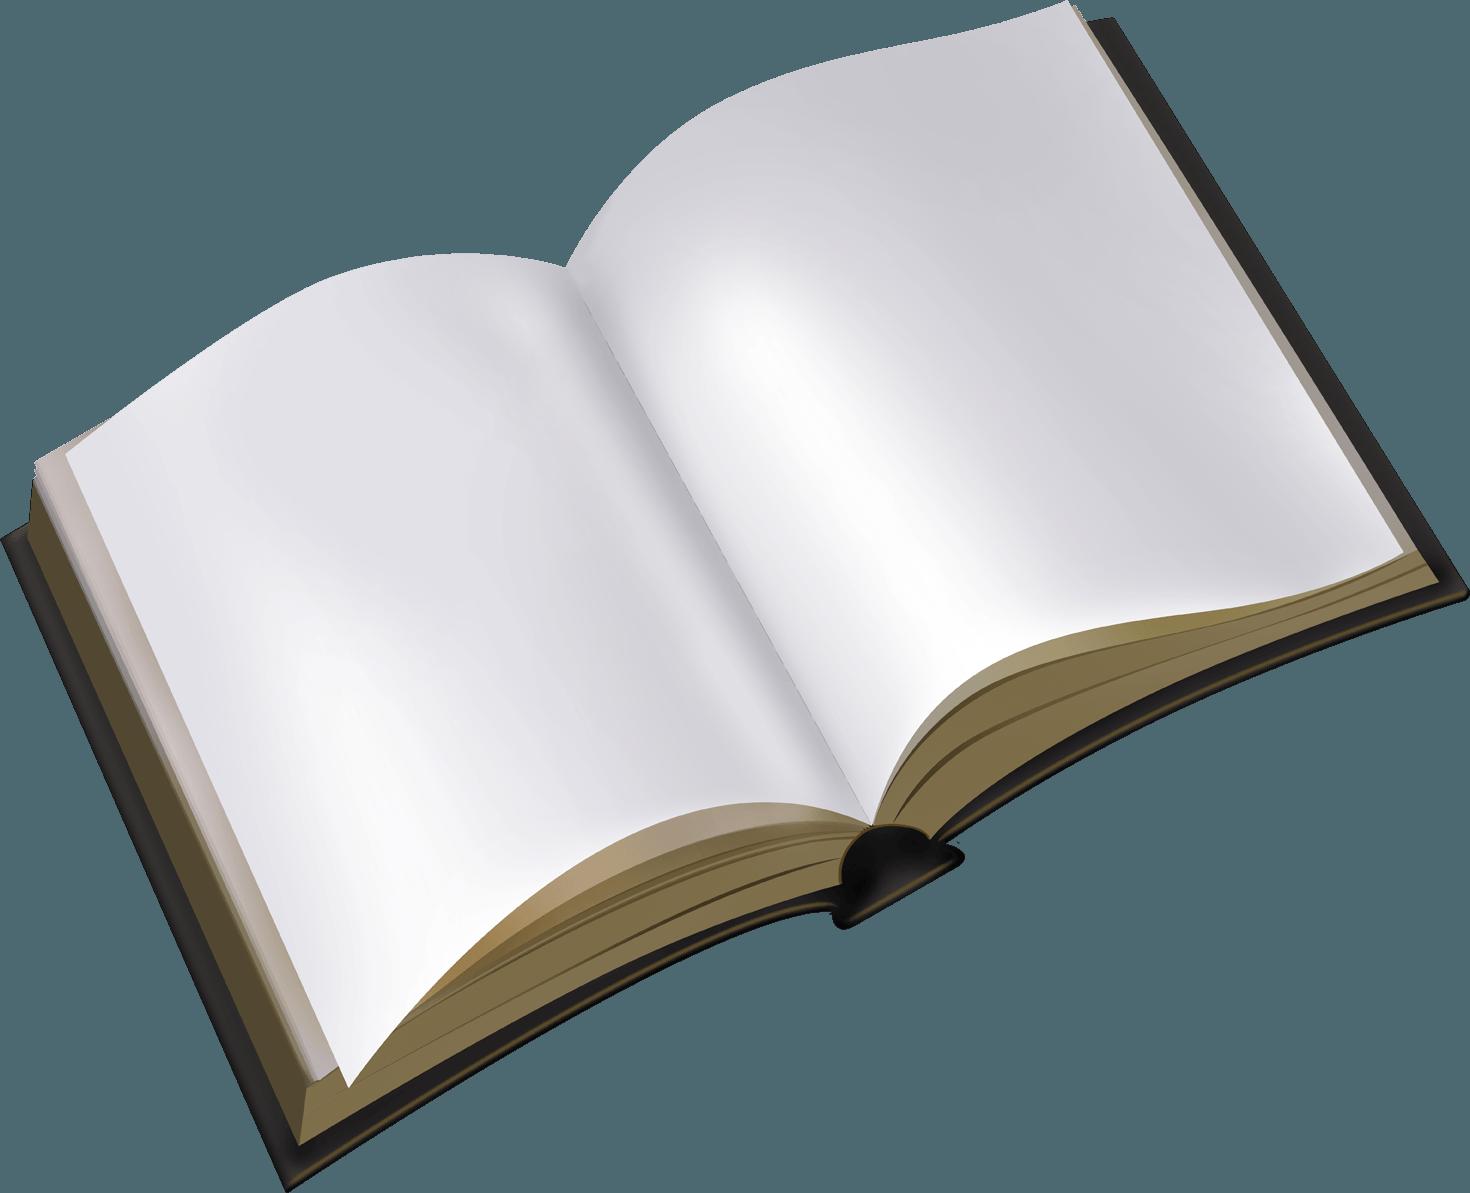 Pin By Freepngimg On Freepngimg Open Book Book Transparent Books